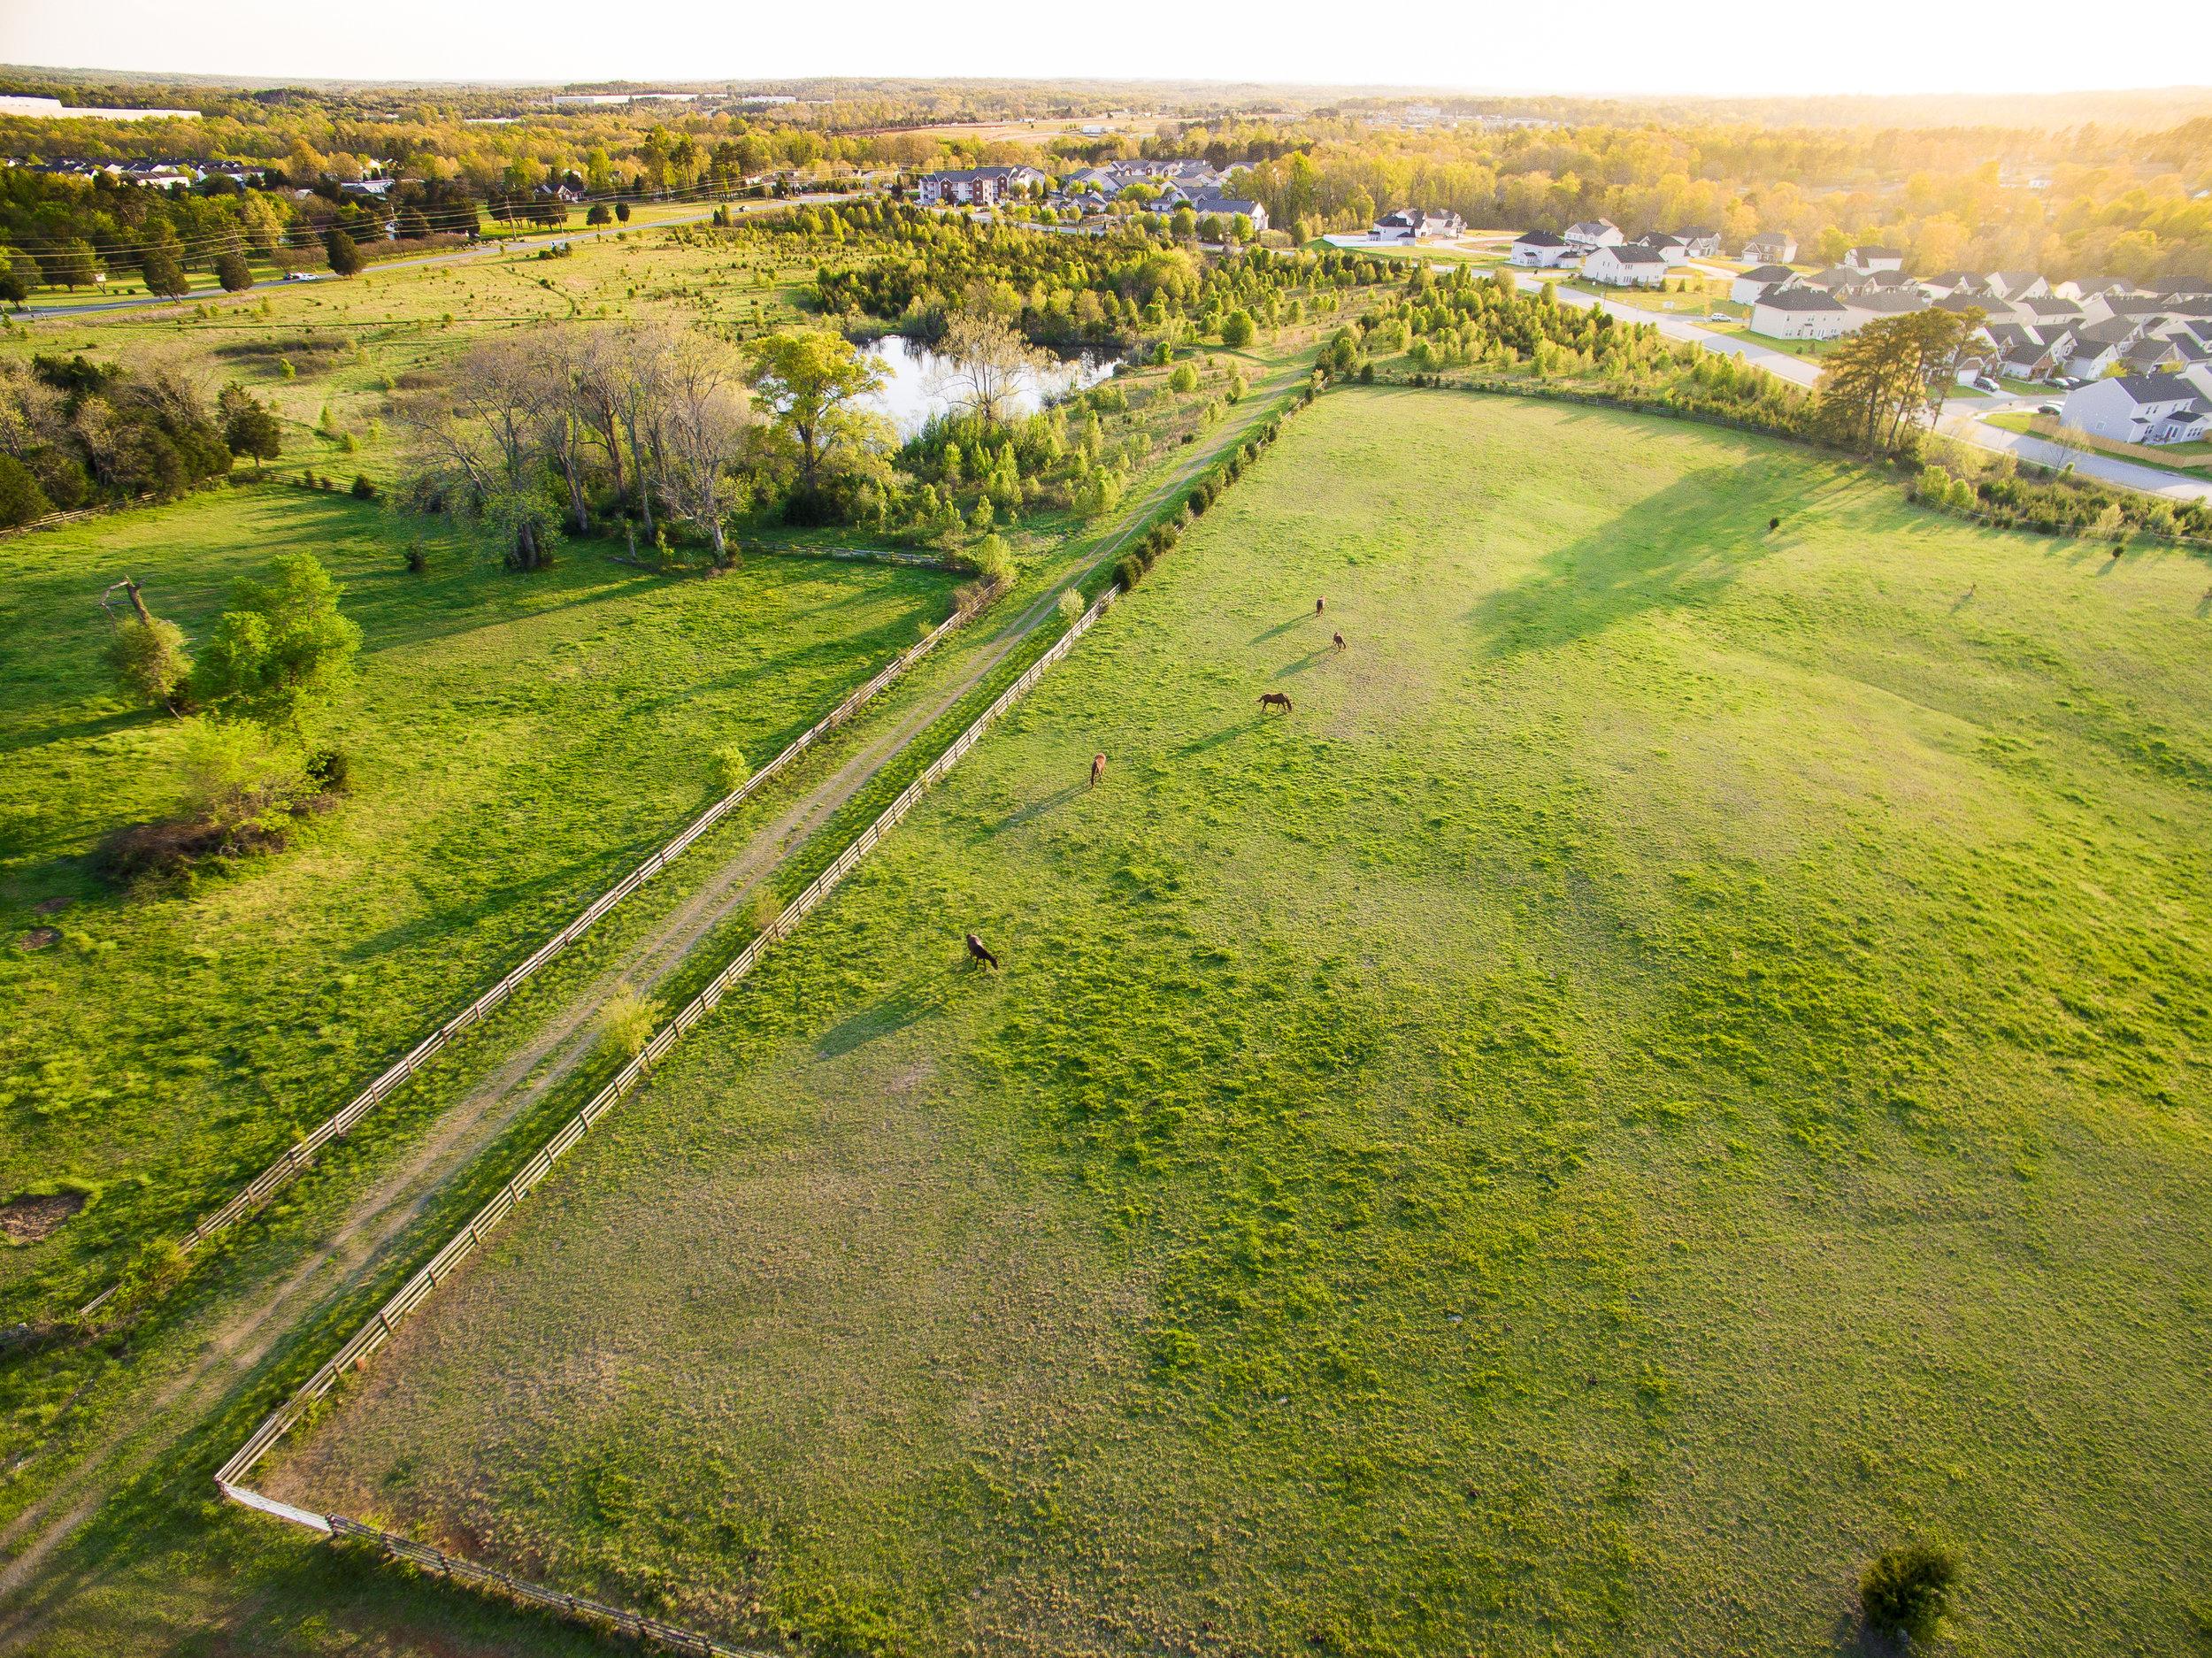 real-estate-photography-drone-photographer-drone-greensboro-nc-triad-211 (1).jpg